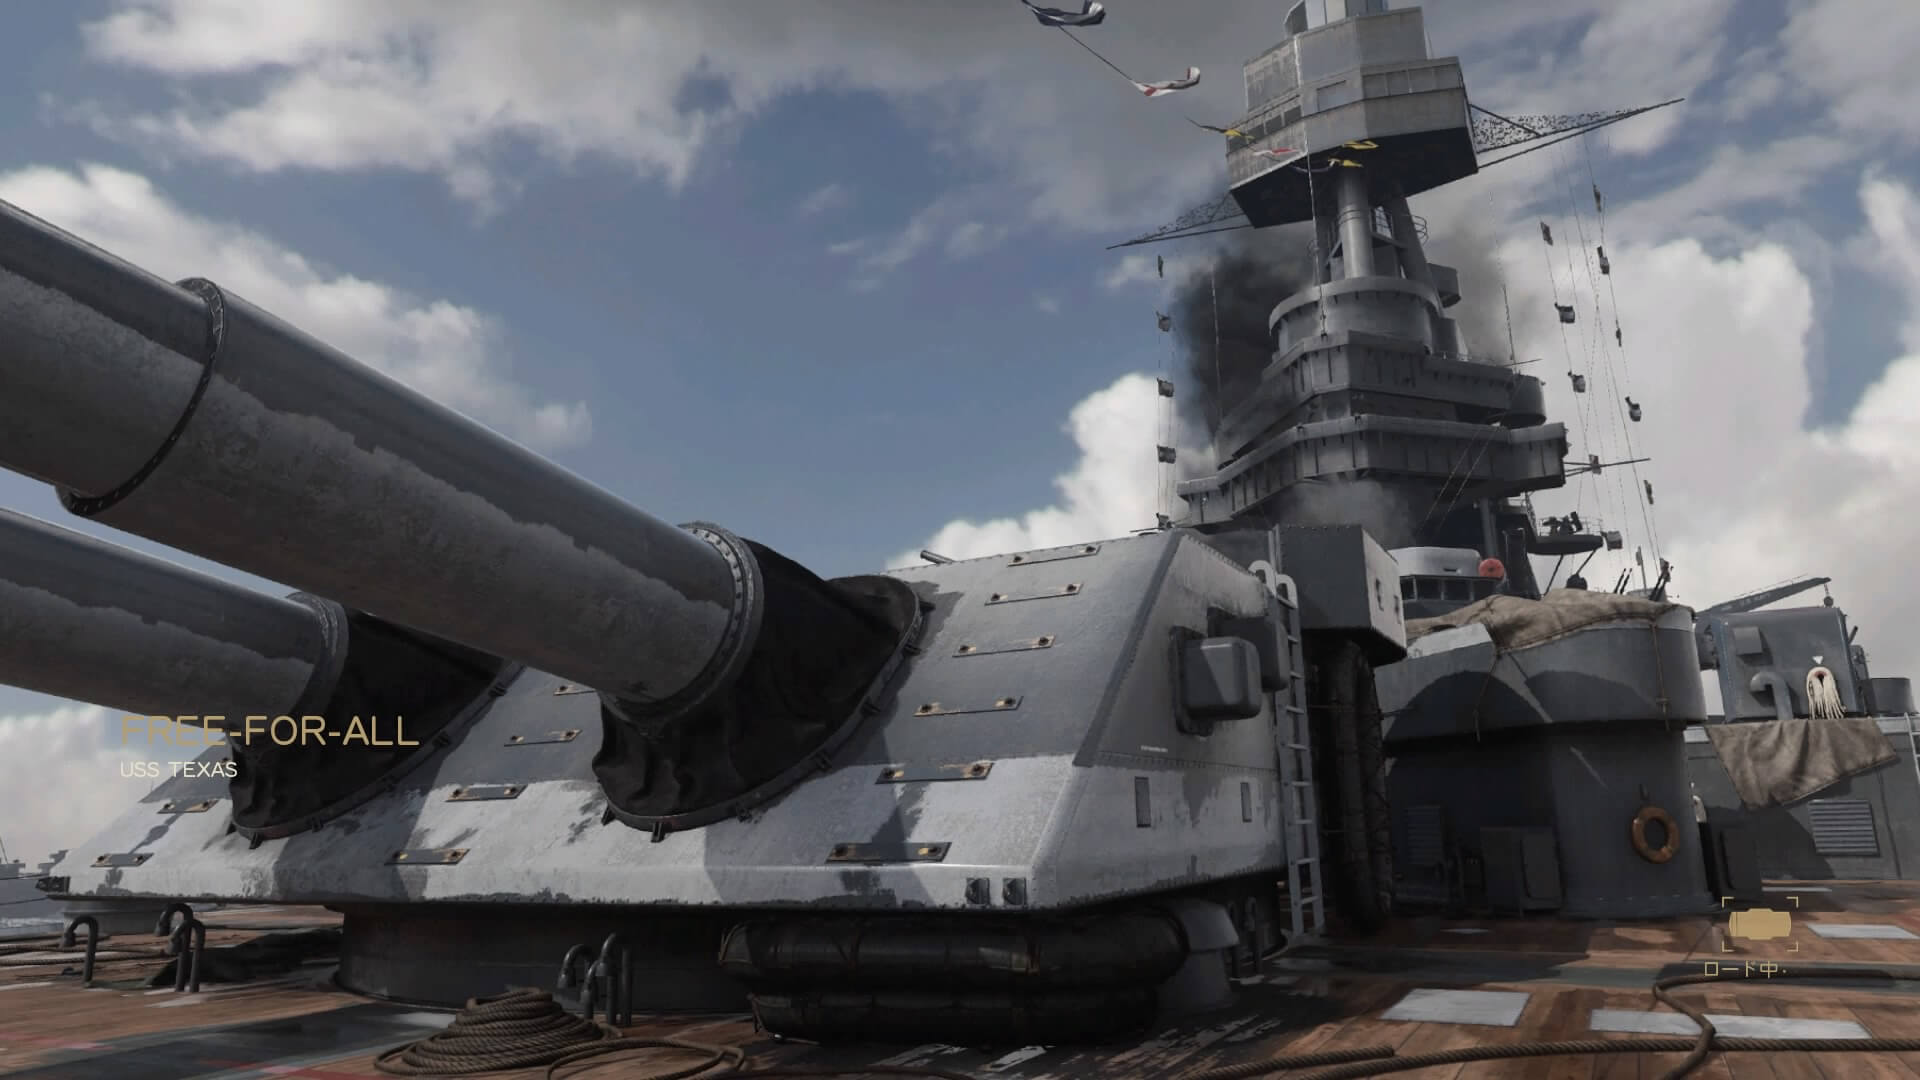 【CoD:WW2】USS TEXASが苦手だから立ち回り、戦い方を考えてみた!強ポジの紹介も【FFA】